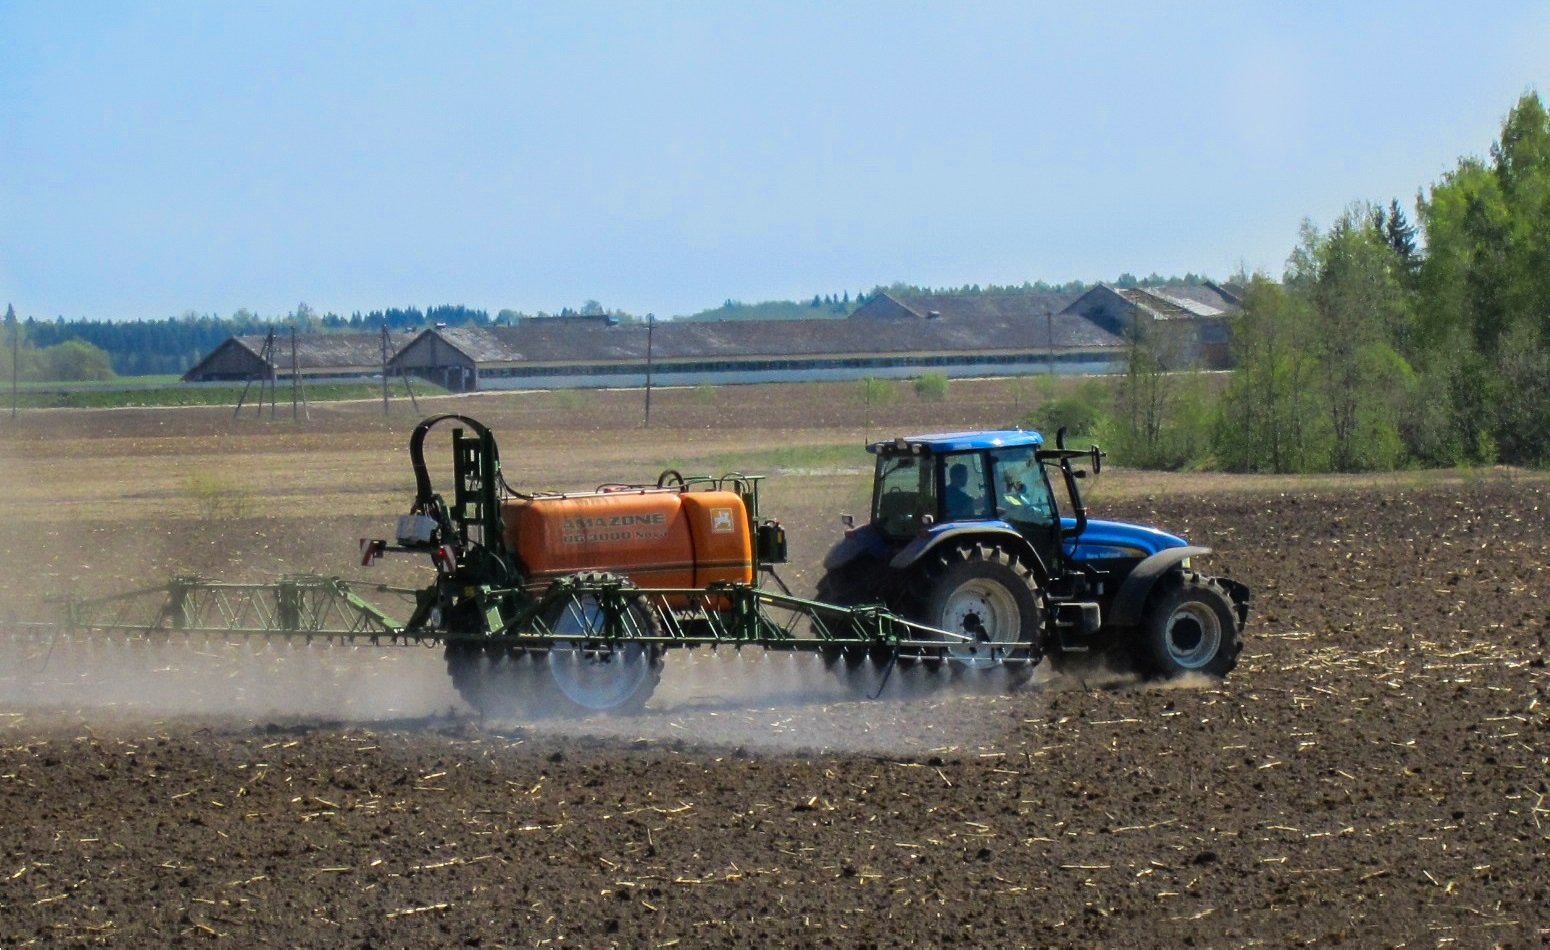 EPA Bans Pesticide Linked to Neurological Damage in Children